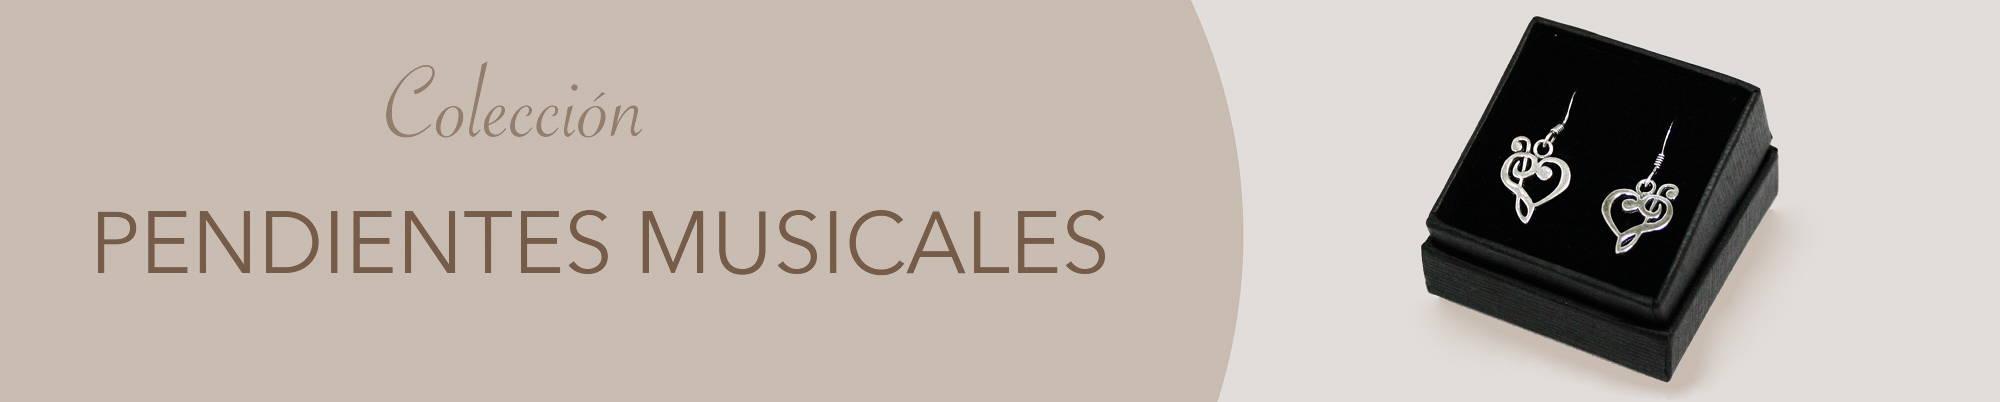 Arracades musicals